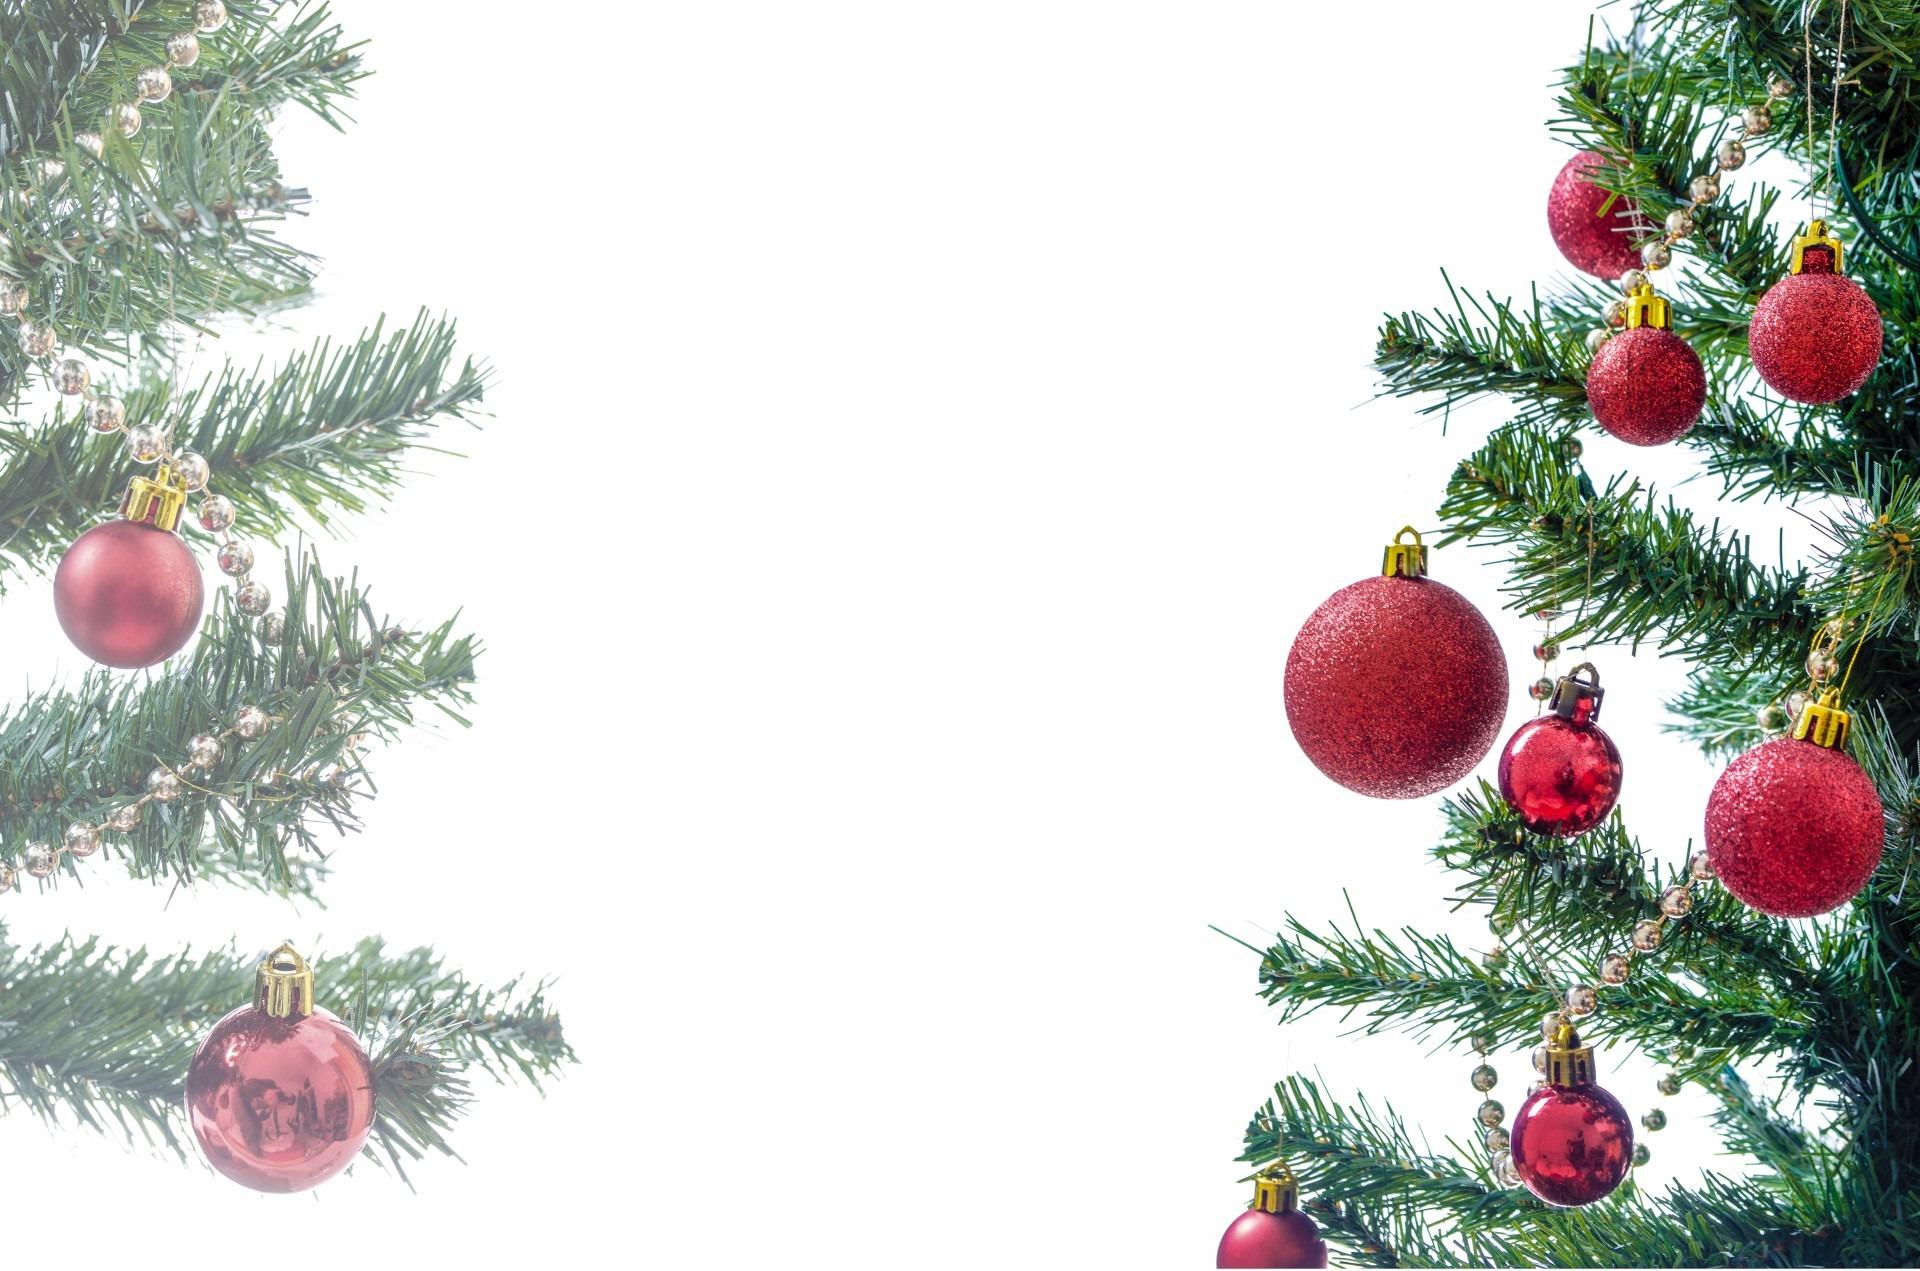 Images gratuites branche isol f te cadeau vacances sapin d cor arbre de no l ornement - Images creches de noel gratuites ...